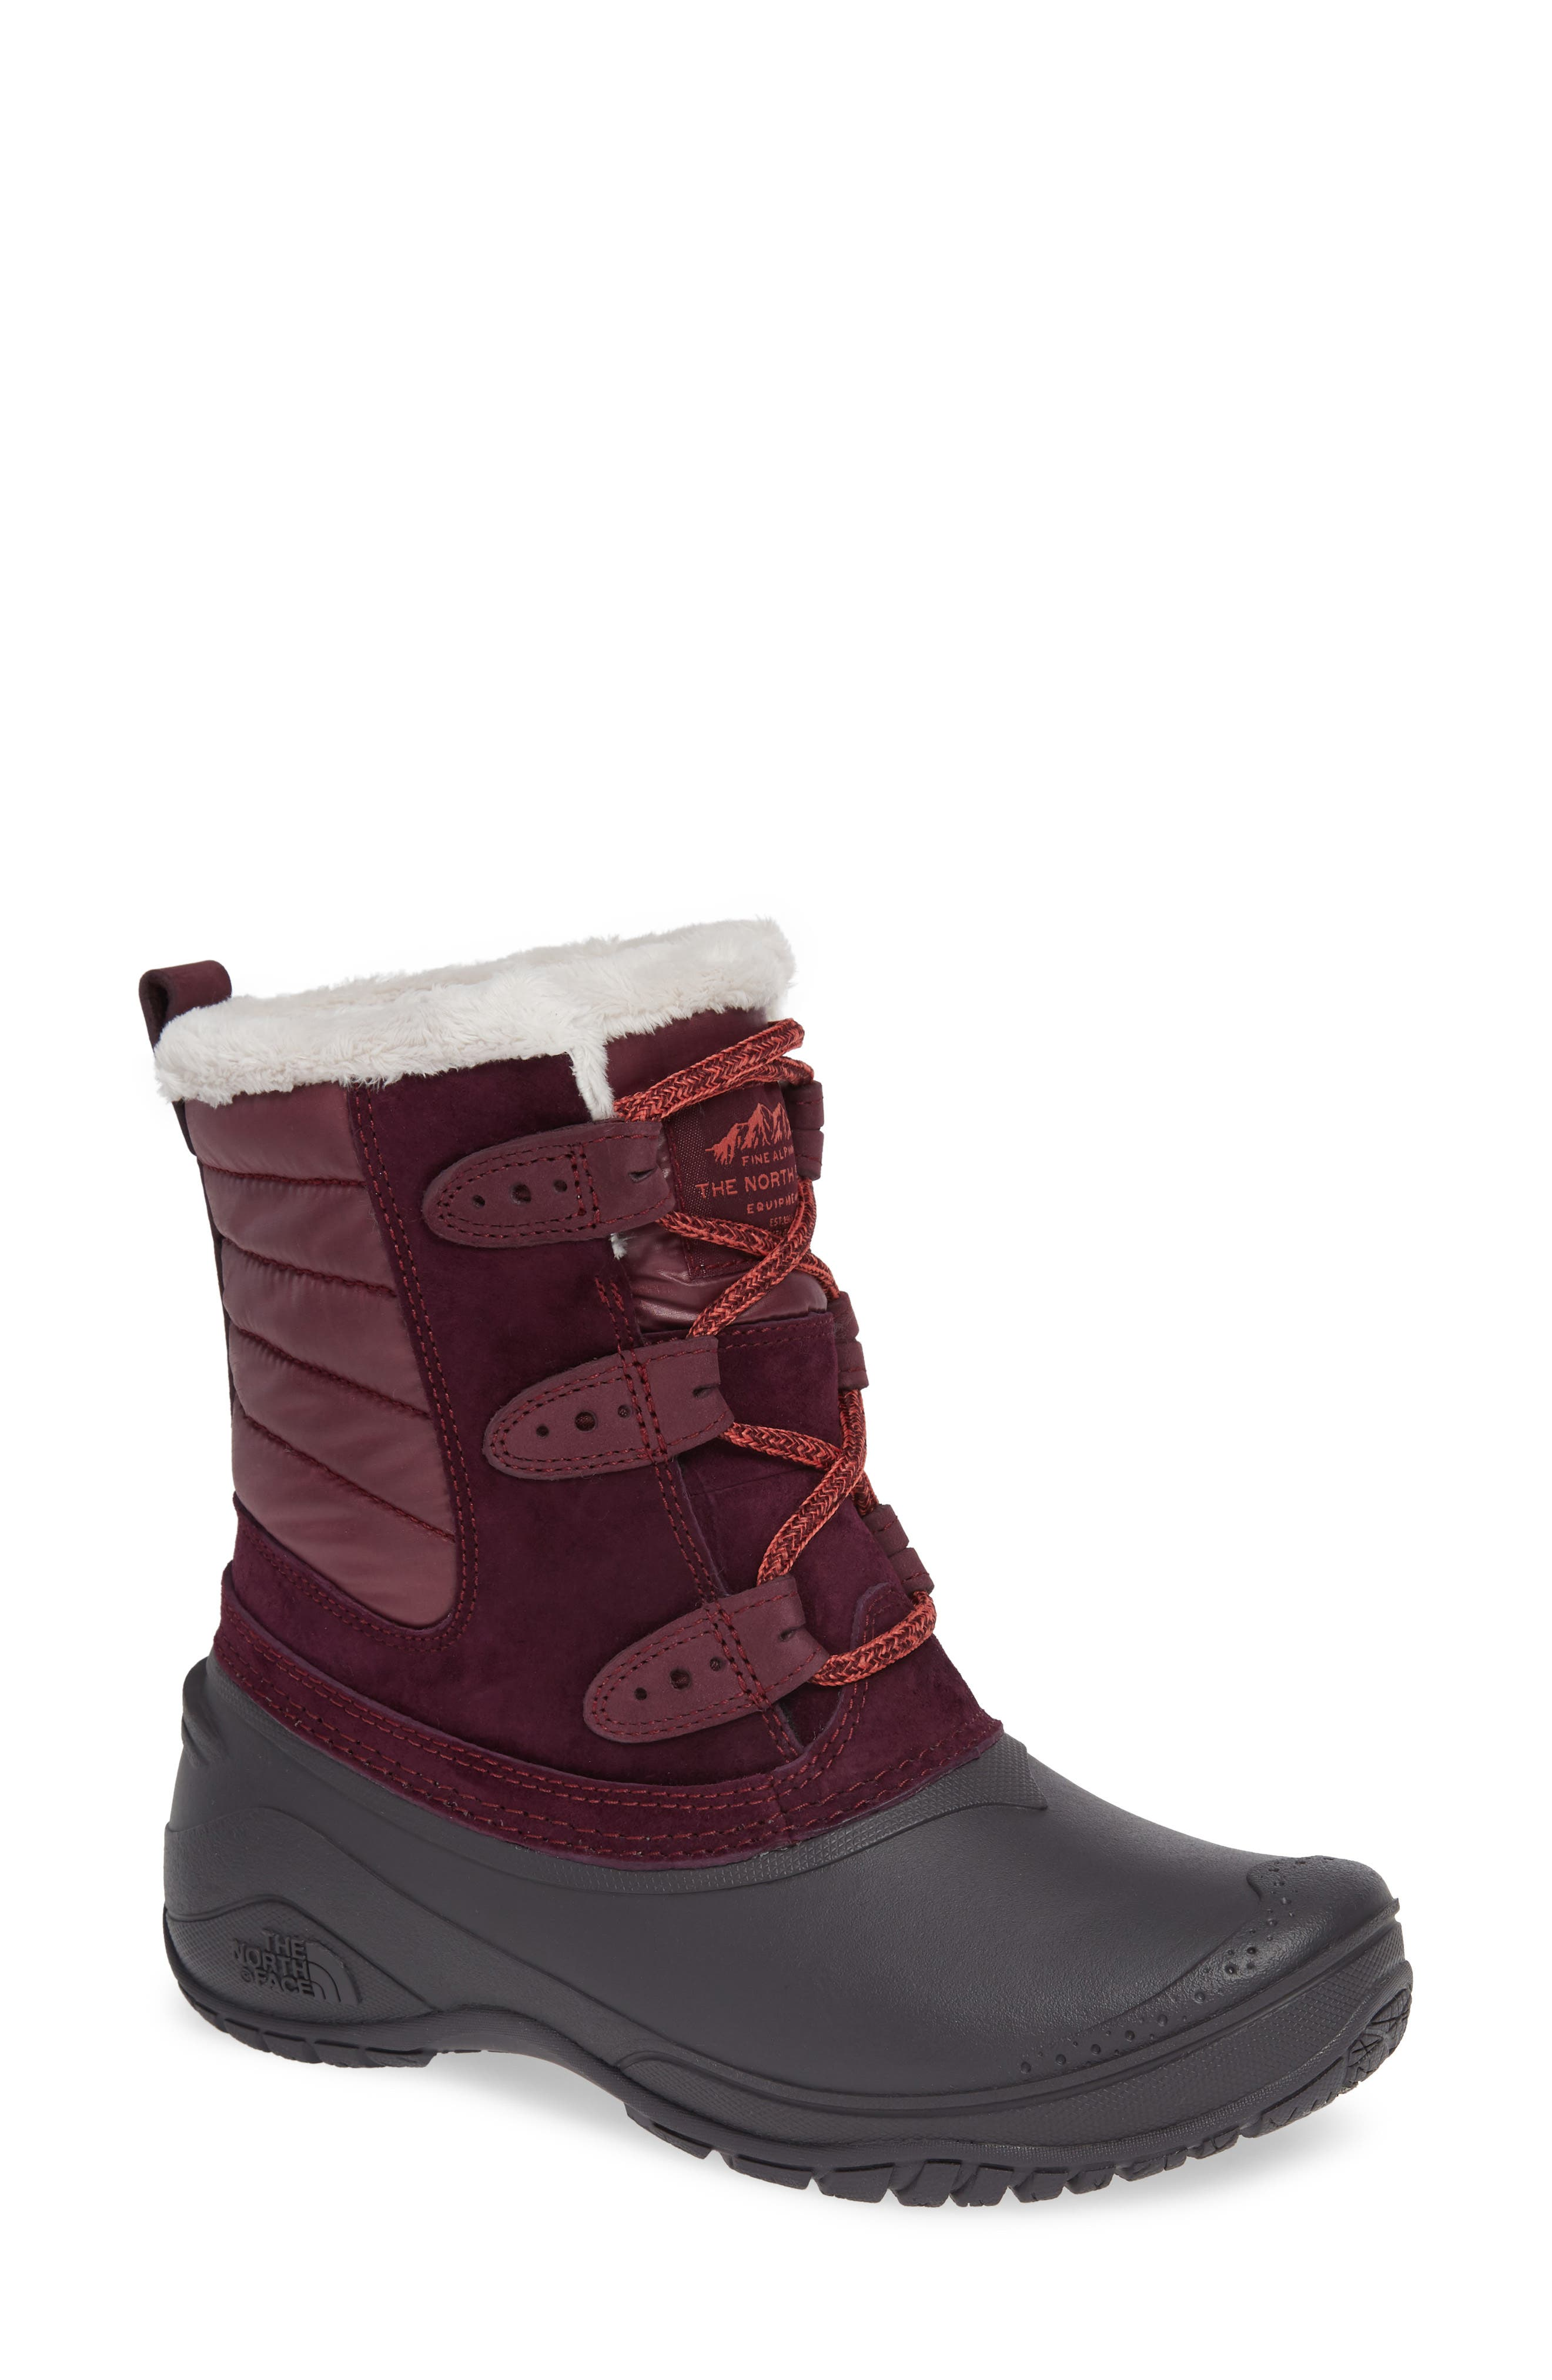 The North Face Shellista Ii Waterproof Boot, Burgundy